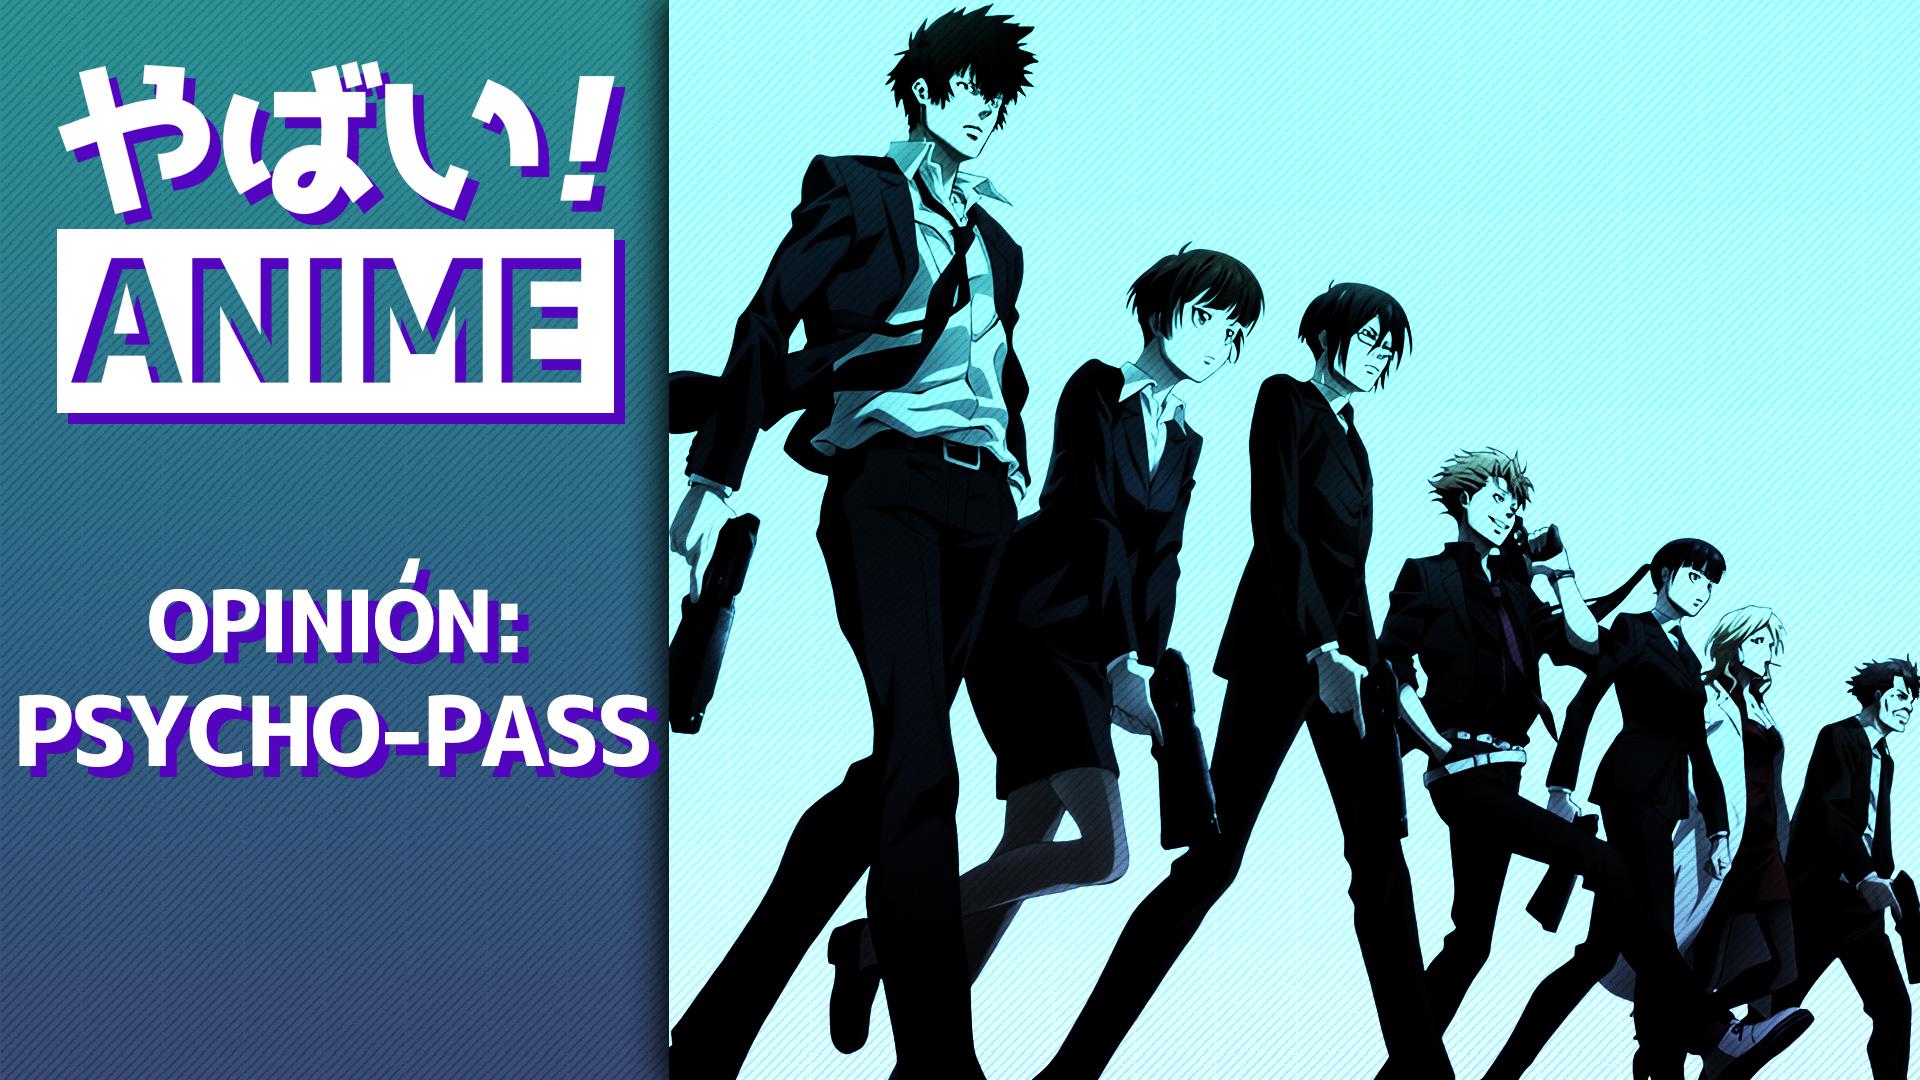 Yabai! Anime – Psycho-Pass